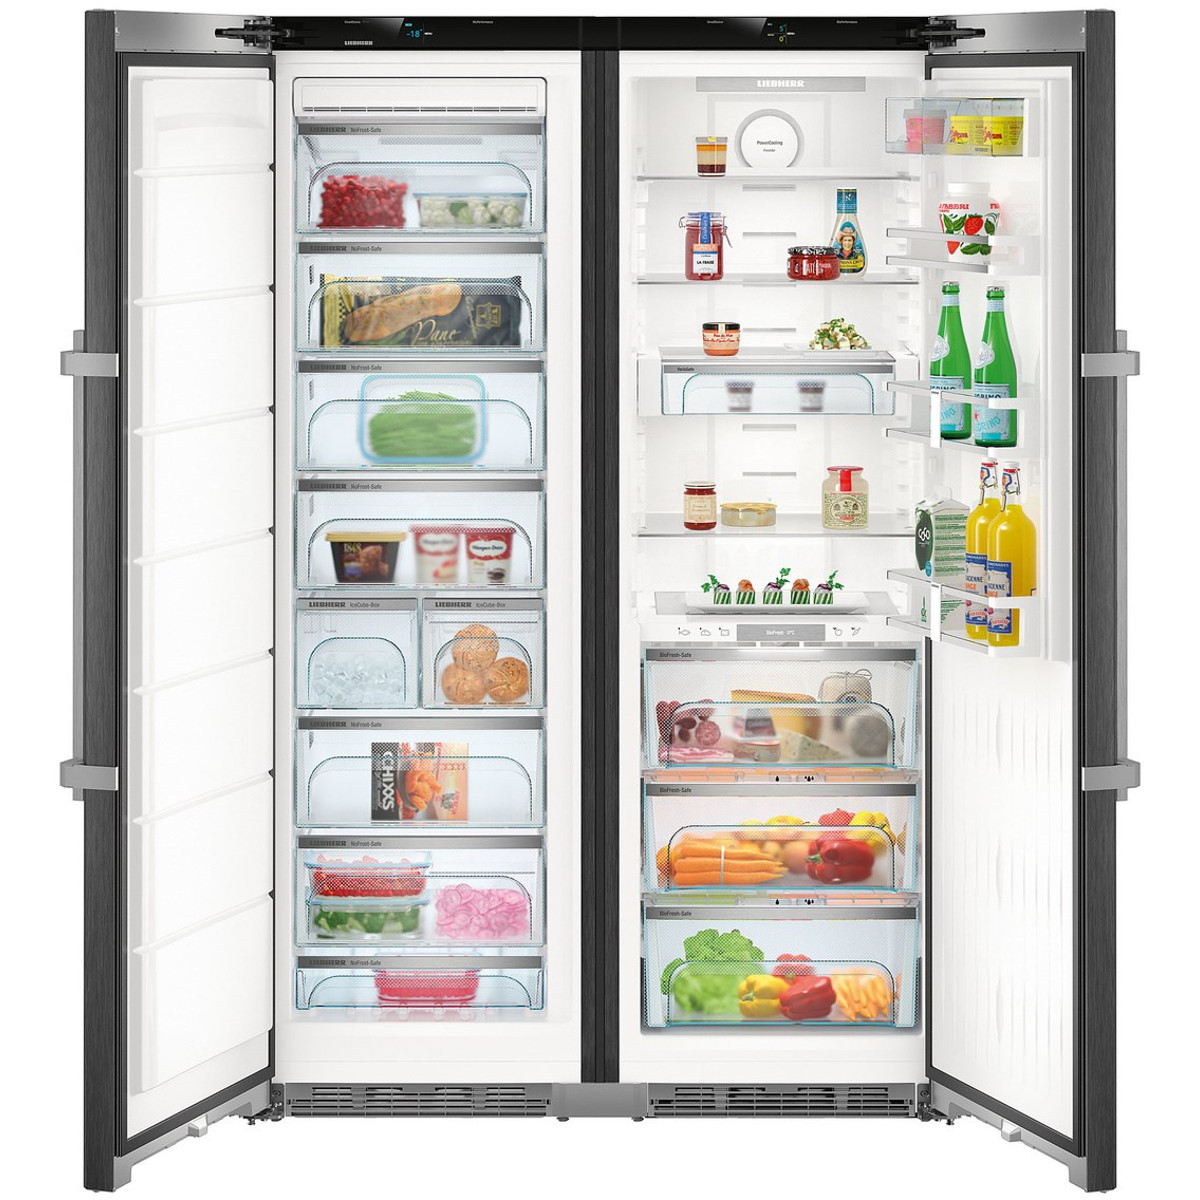 liebherr sbsbs 8673 premium biofresh nofrost side by side fridge freezer ex display clearance. Black Bedroom Furniture Sets. Home Design Ideas